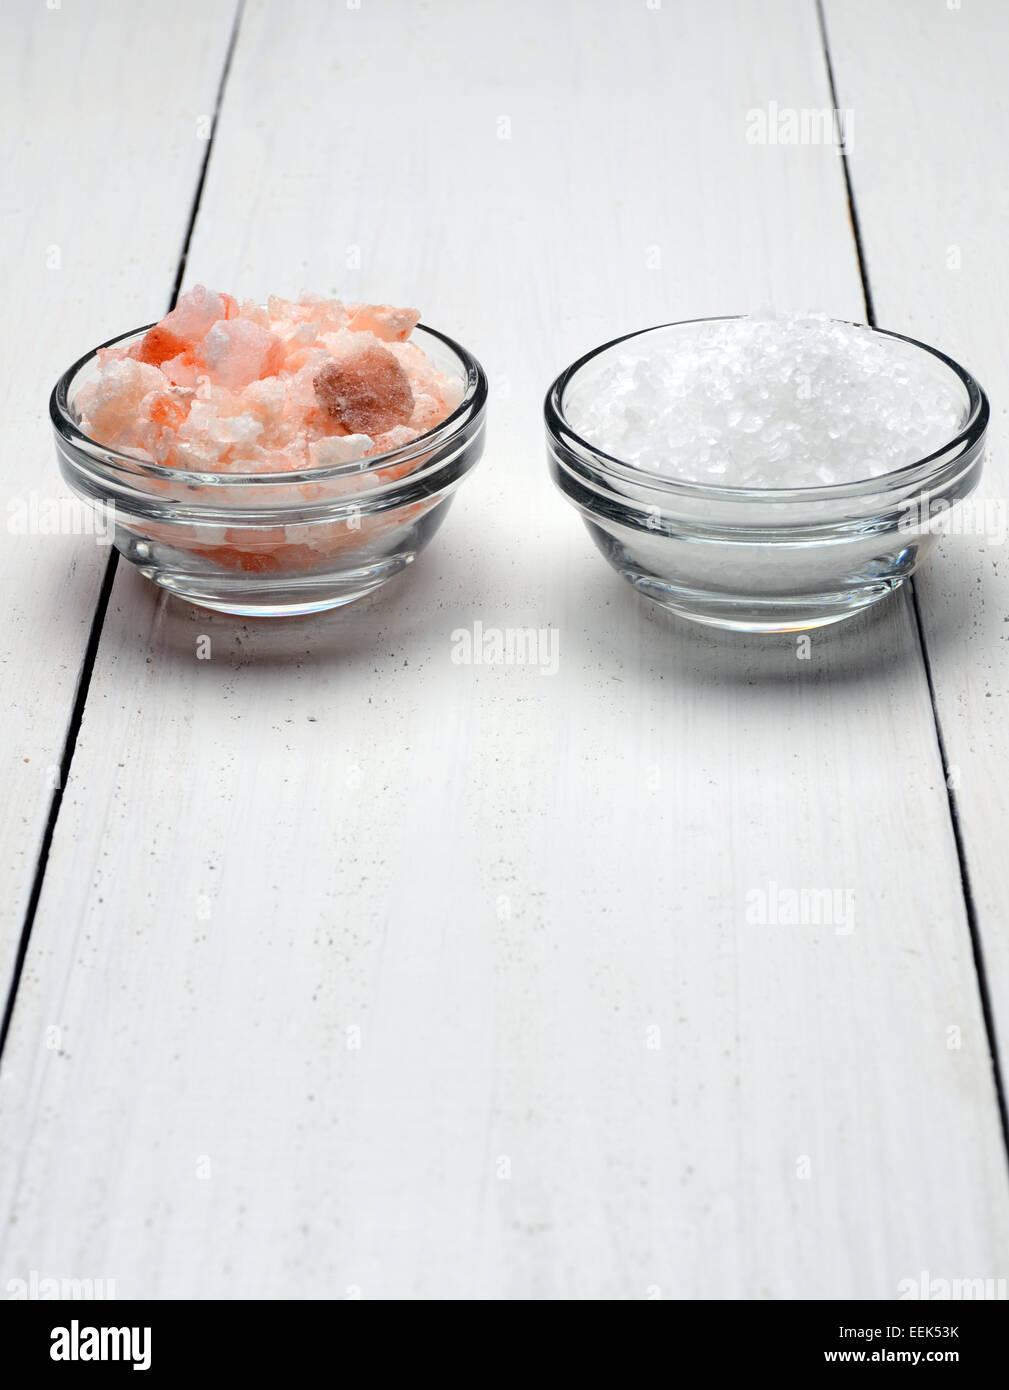 Himalayan pink salt, and sea salt on a wooden table - Stock Image